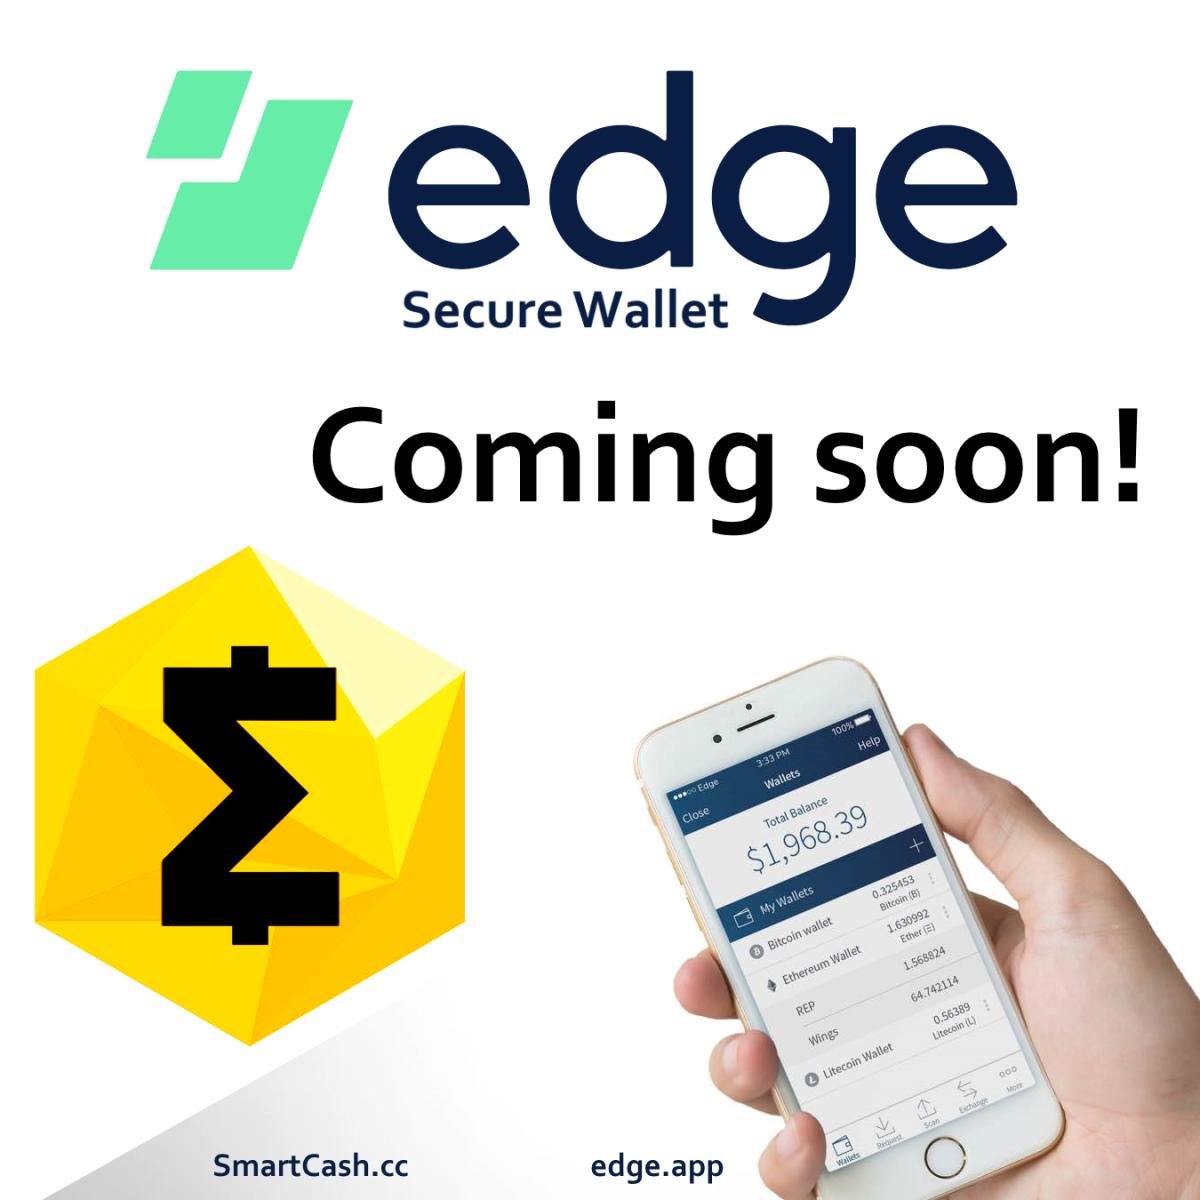 Edge Secure Wallet